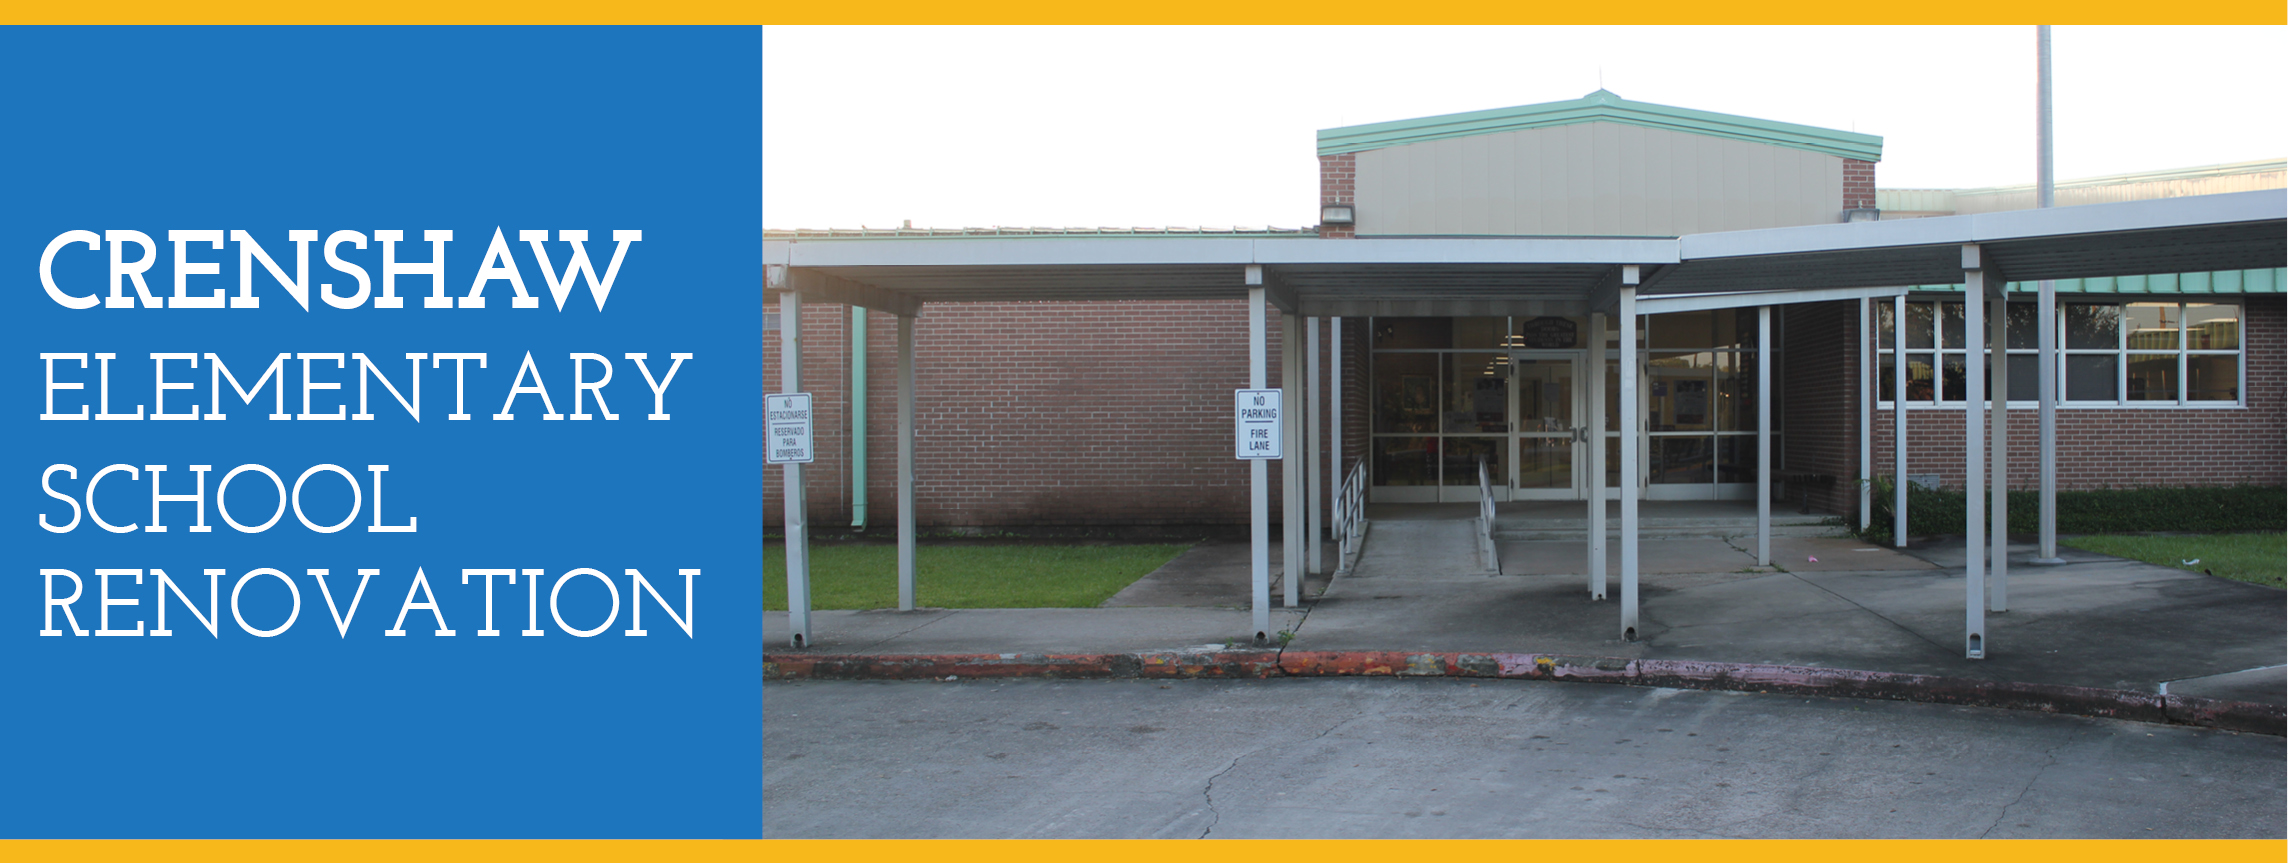 Crenshaw Elementary.jpg